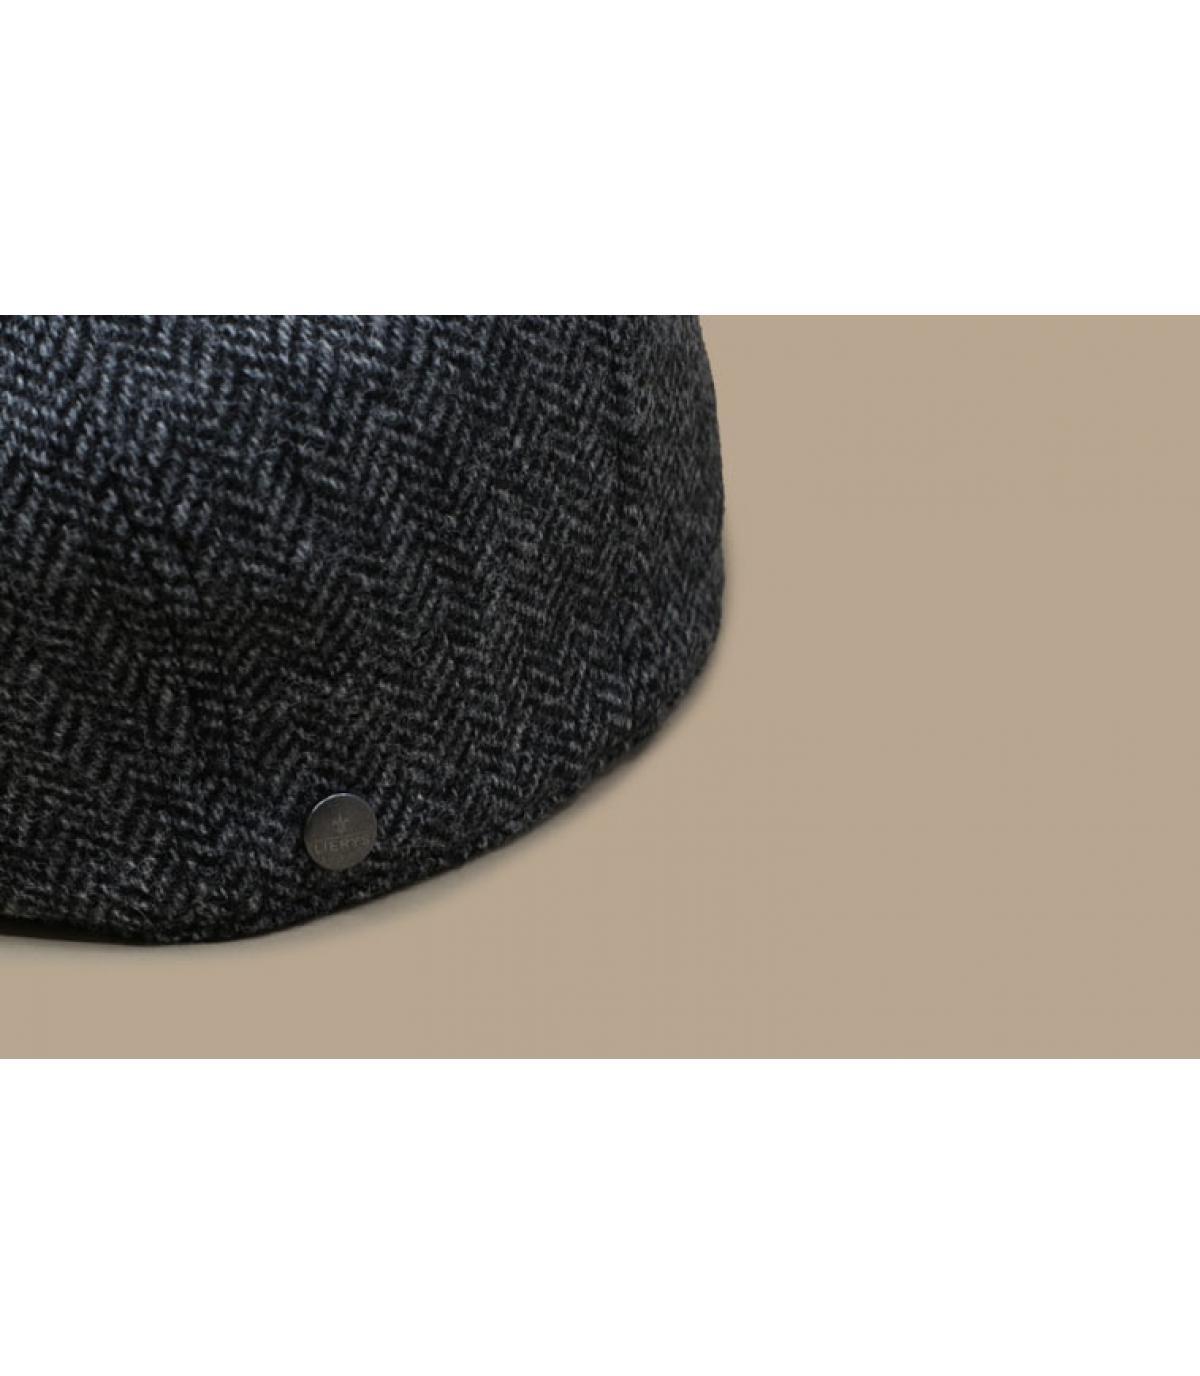 Détails Britton Wool Herringbone grey - image 3